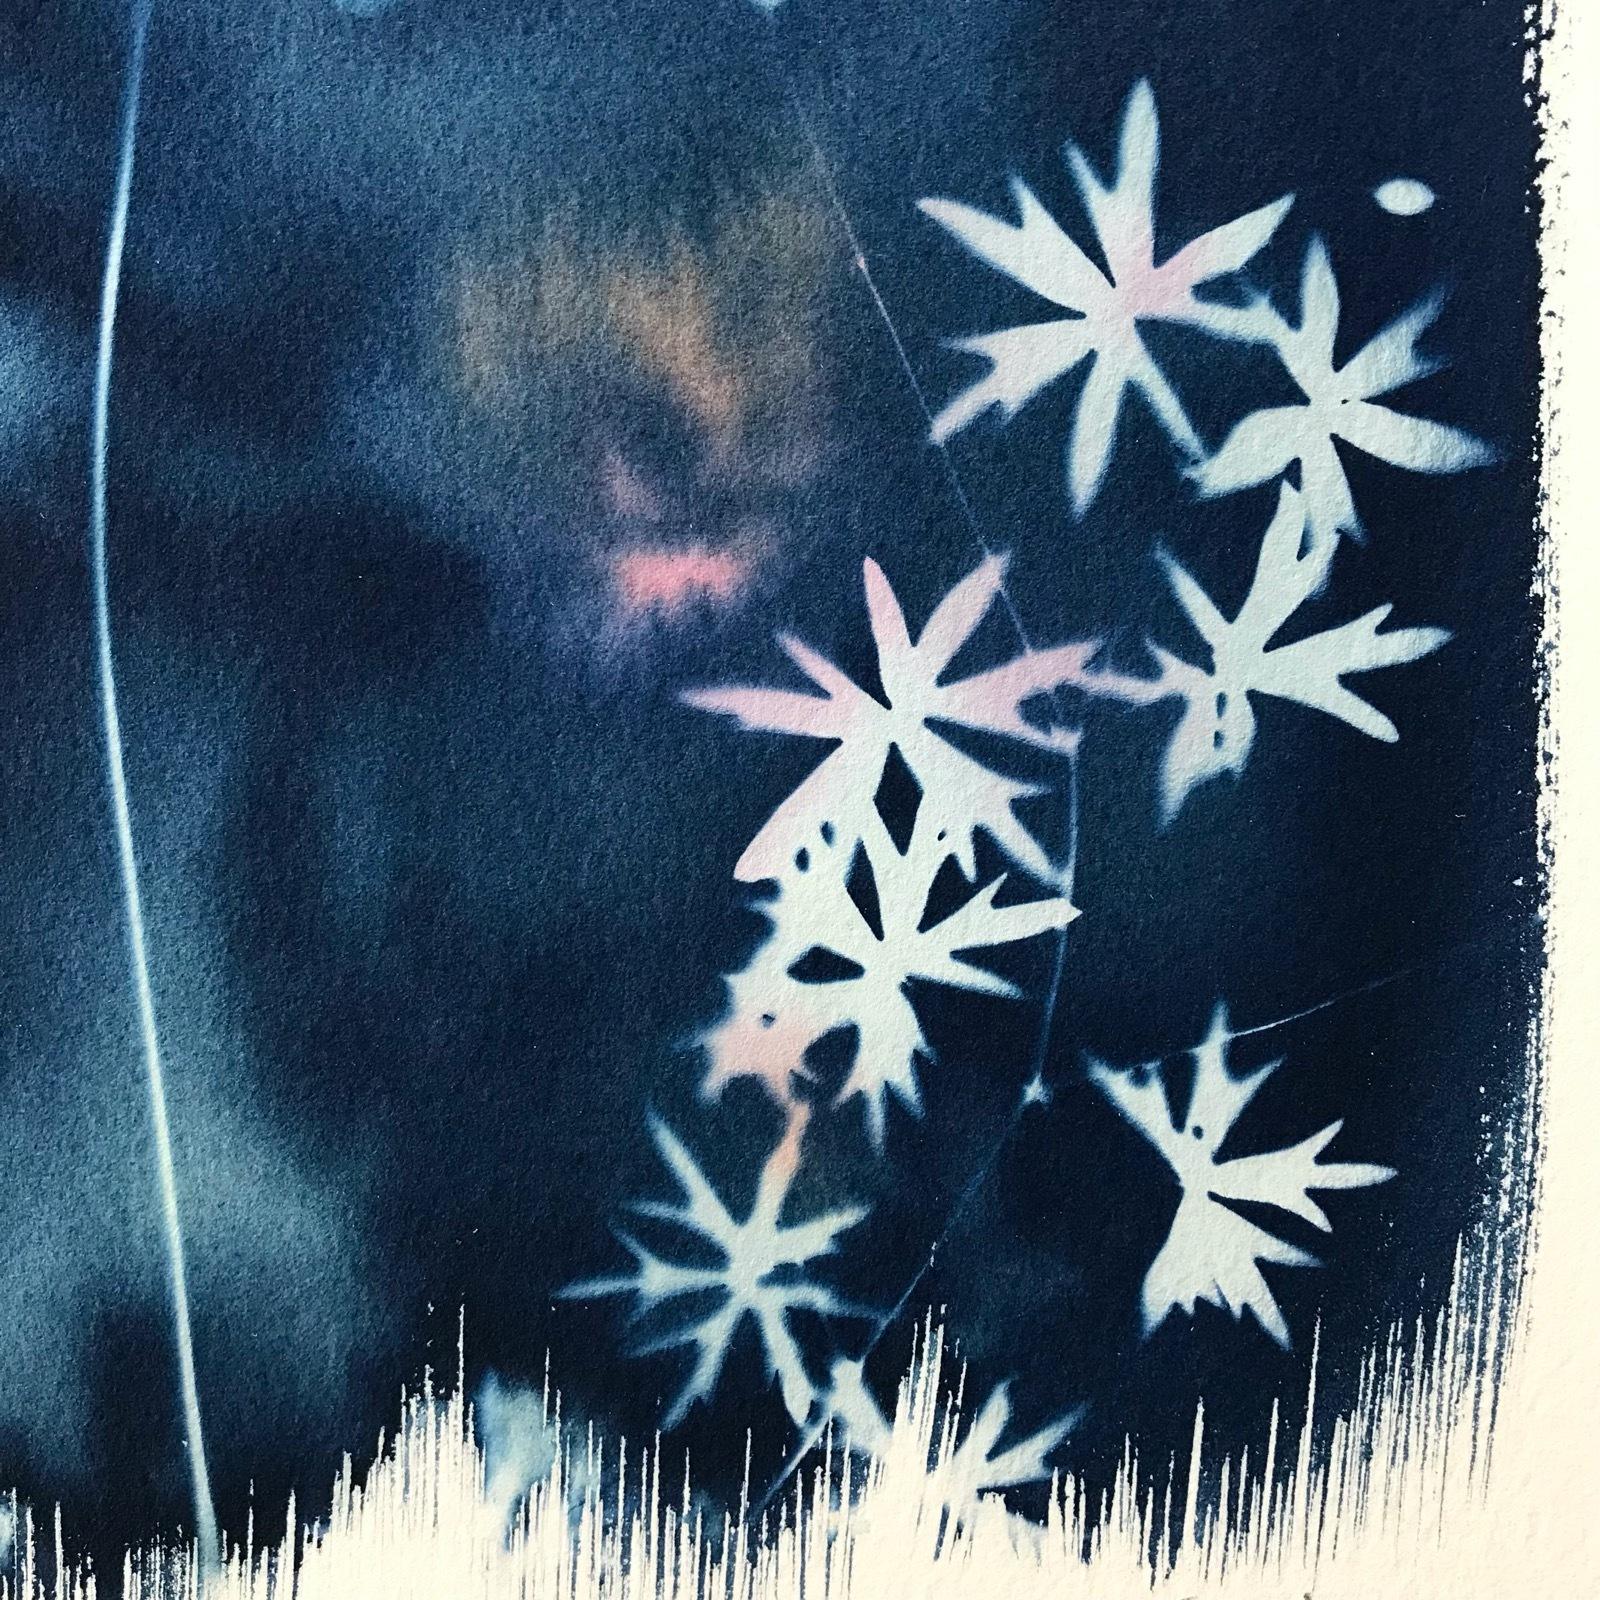 Cyanotype with anemone 16